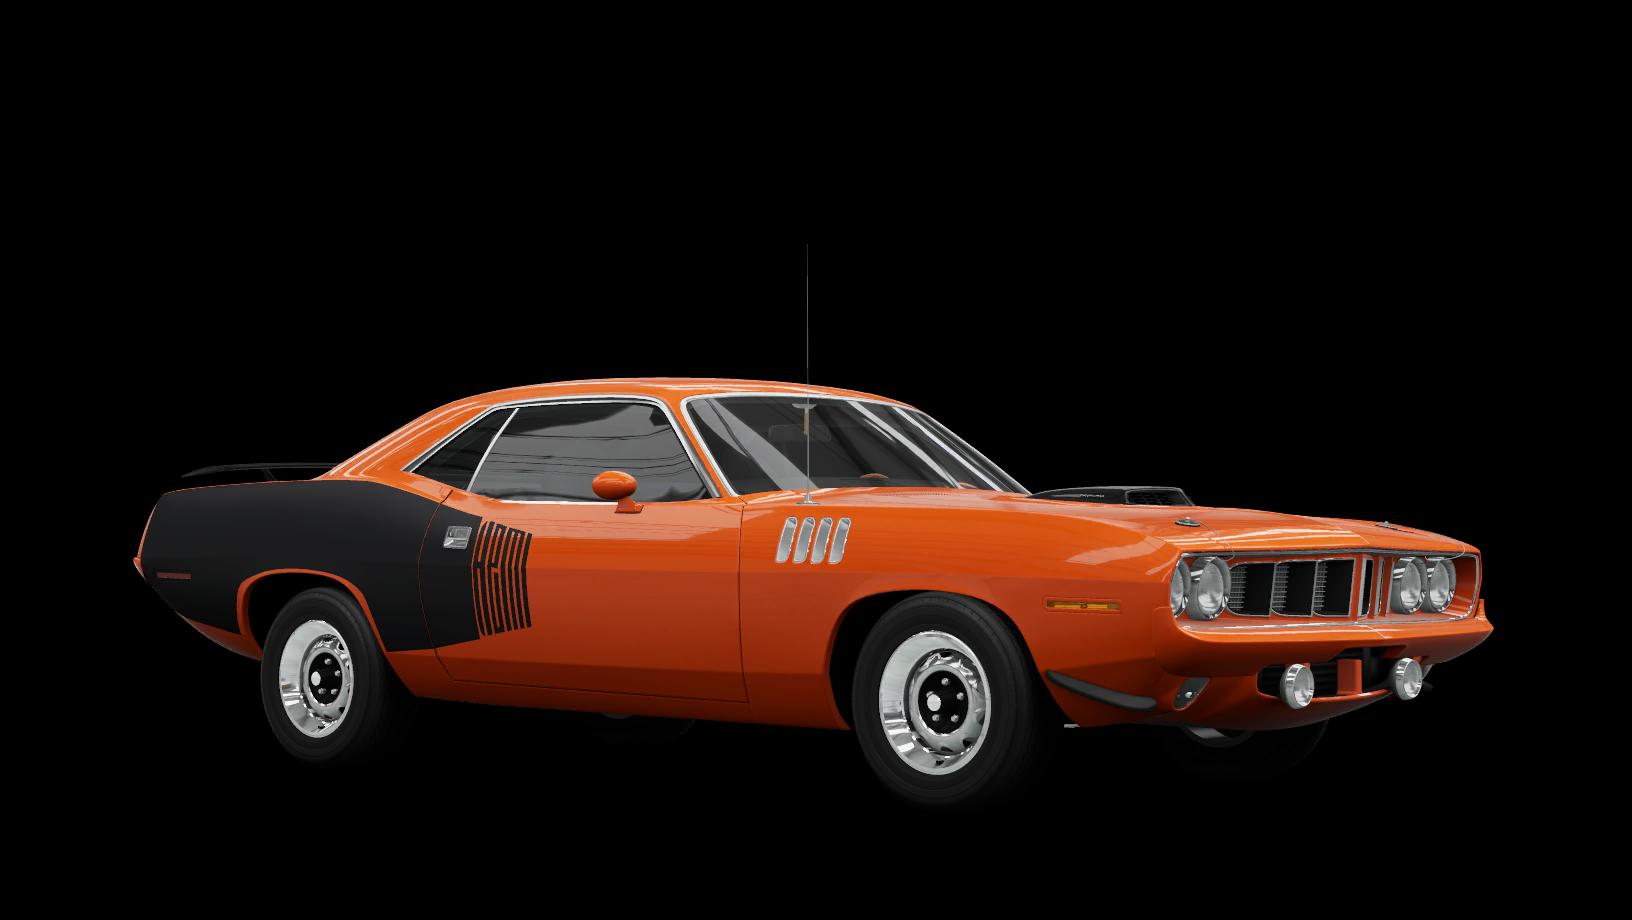 Plymouth Cuda 426 HEMI